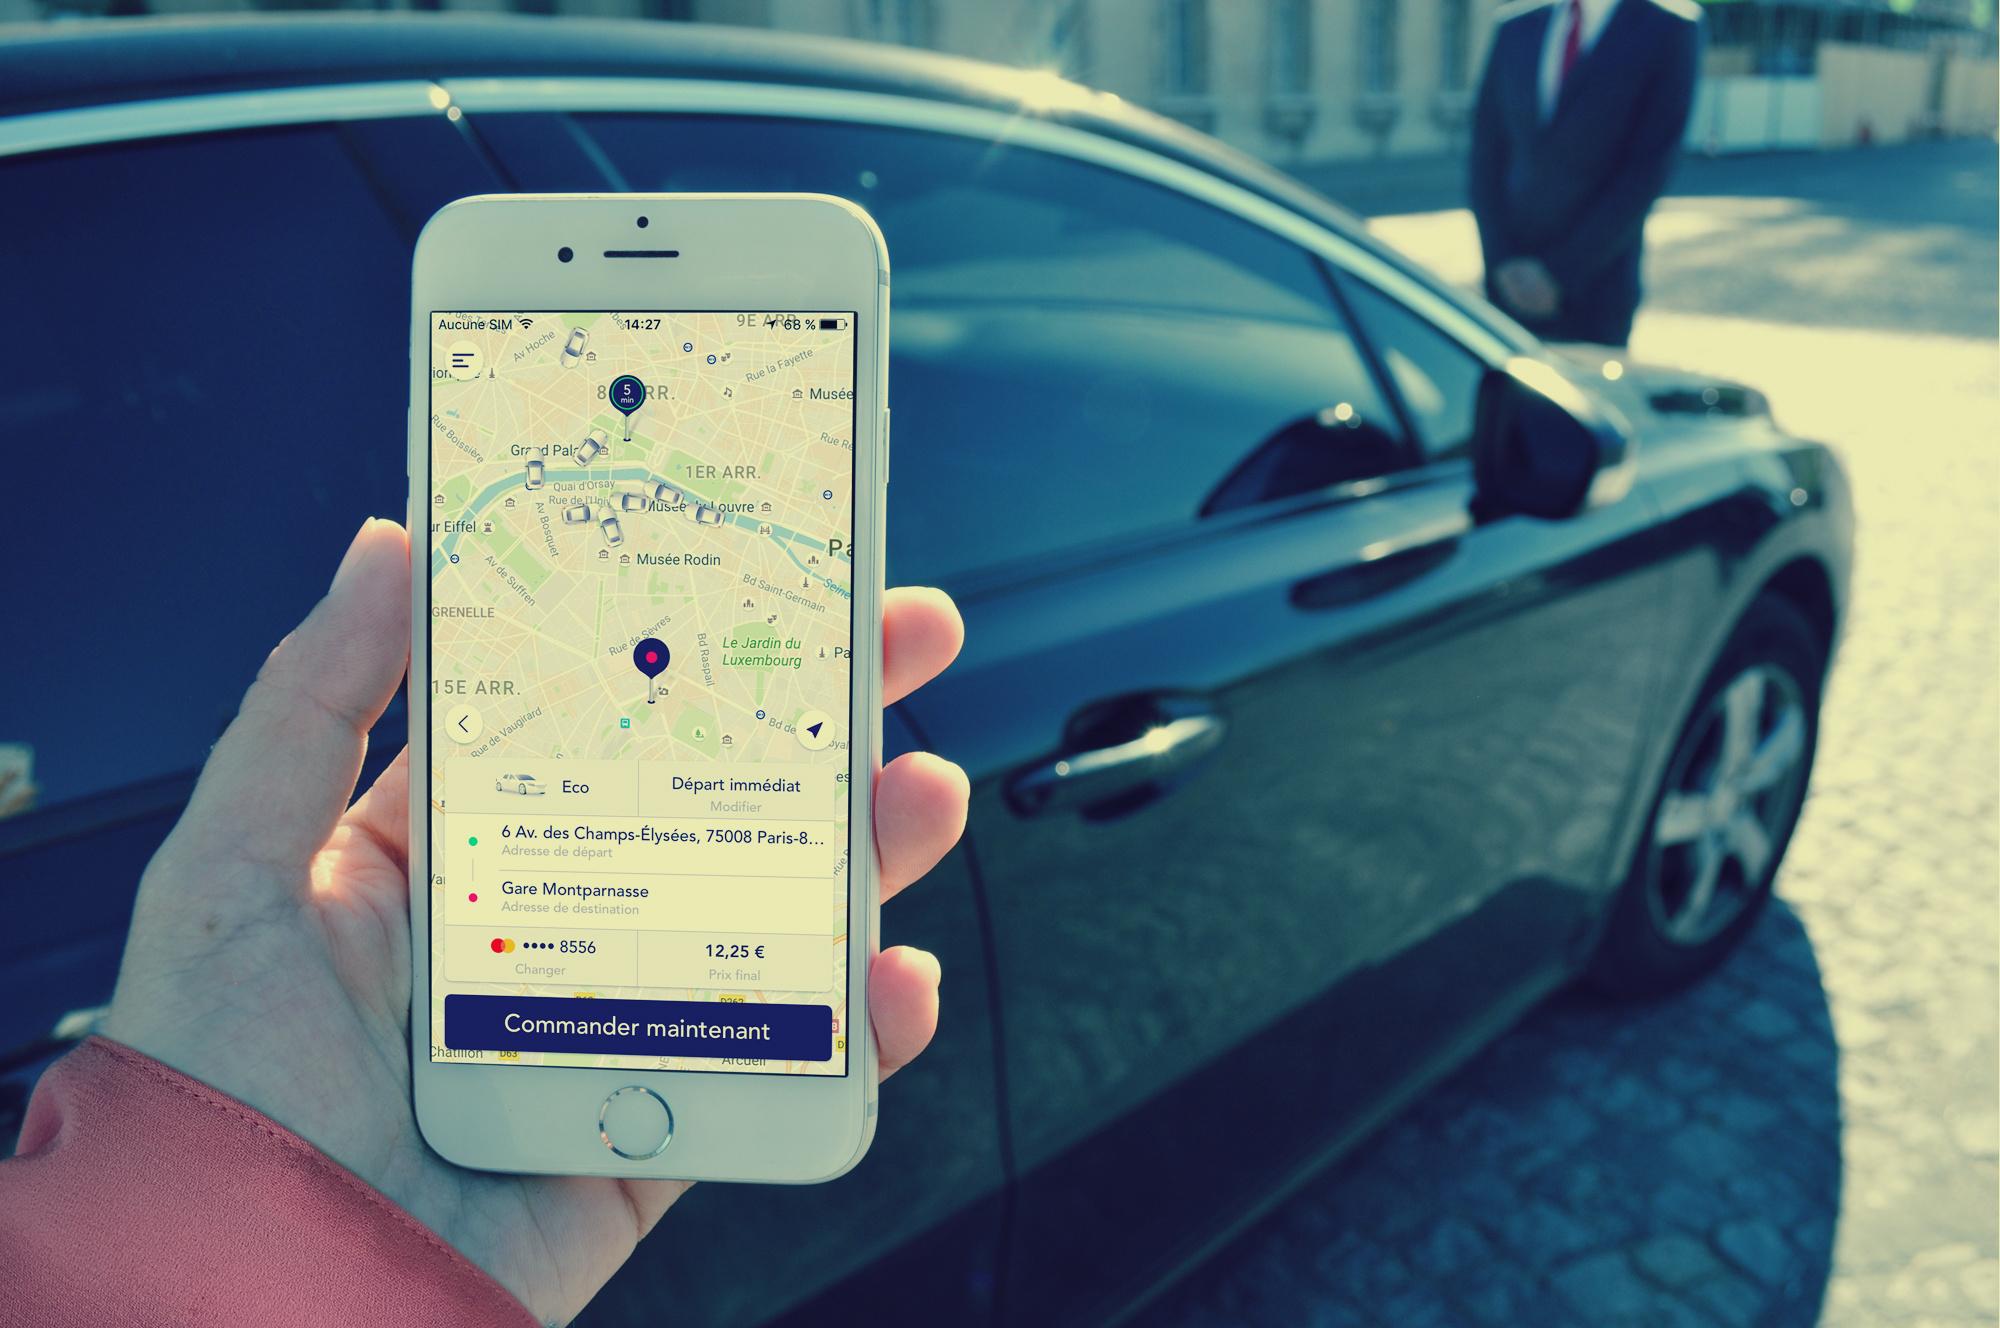 Chauffeur-Prive – VTC pas cher – Dealabs